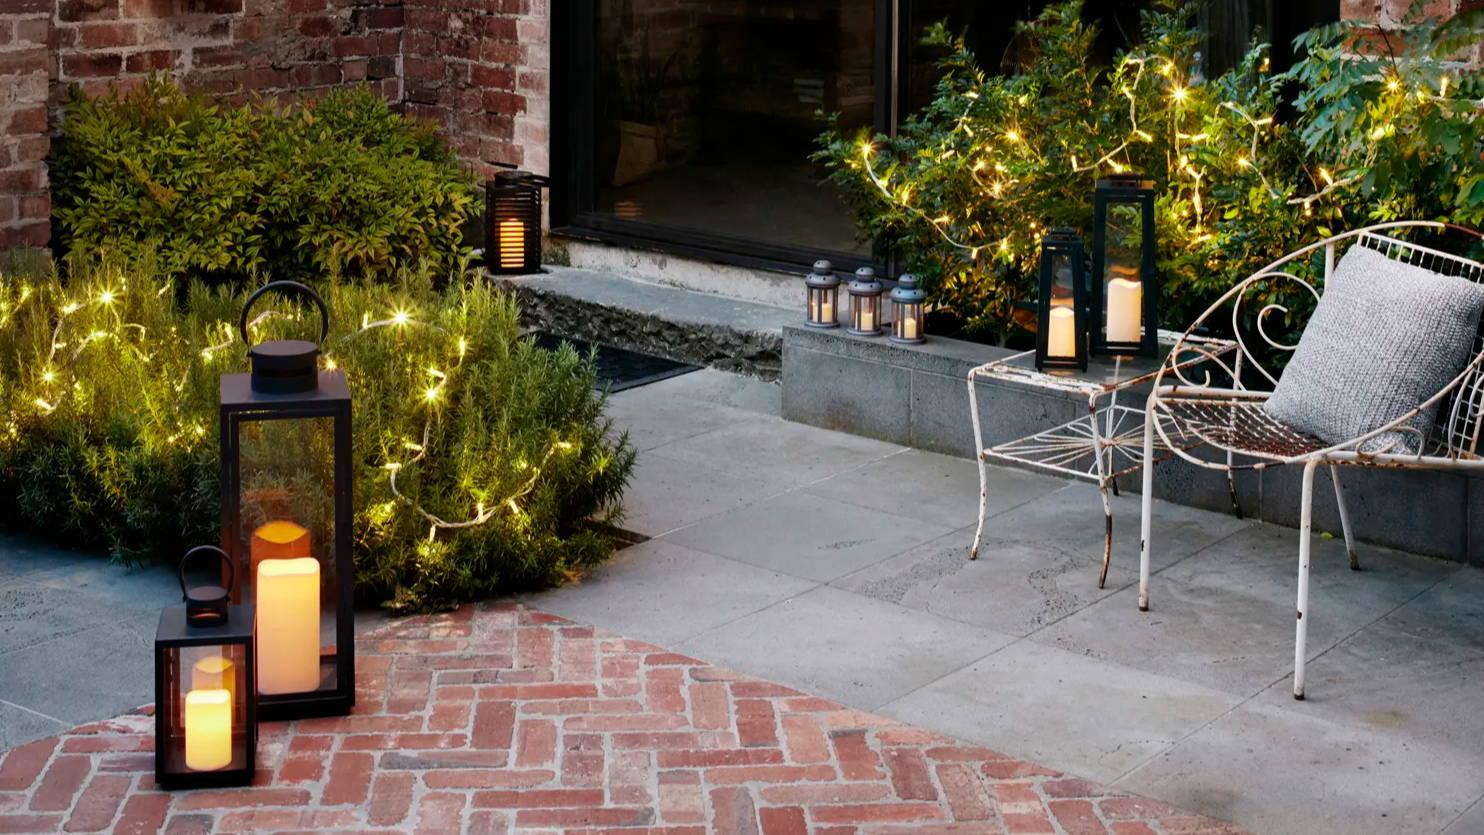 Patio with outdoor lanterns and fairy lights illuminated